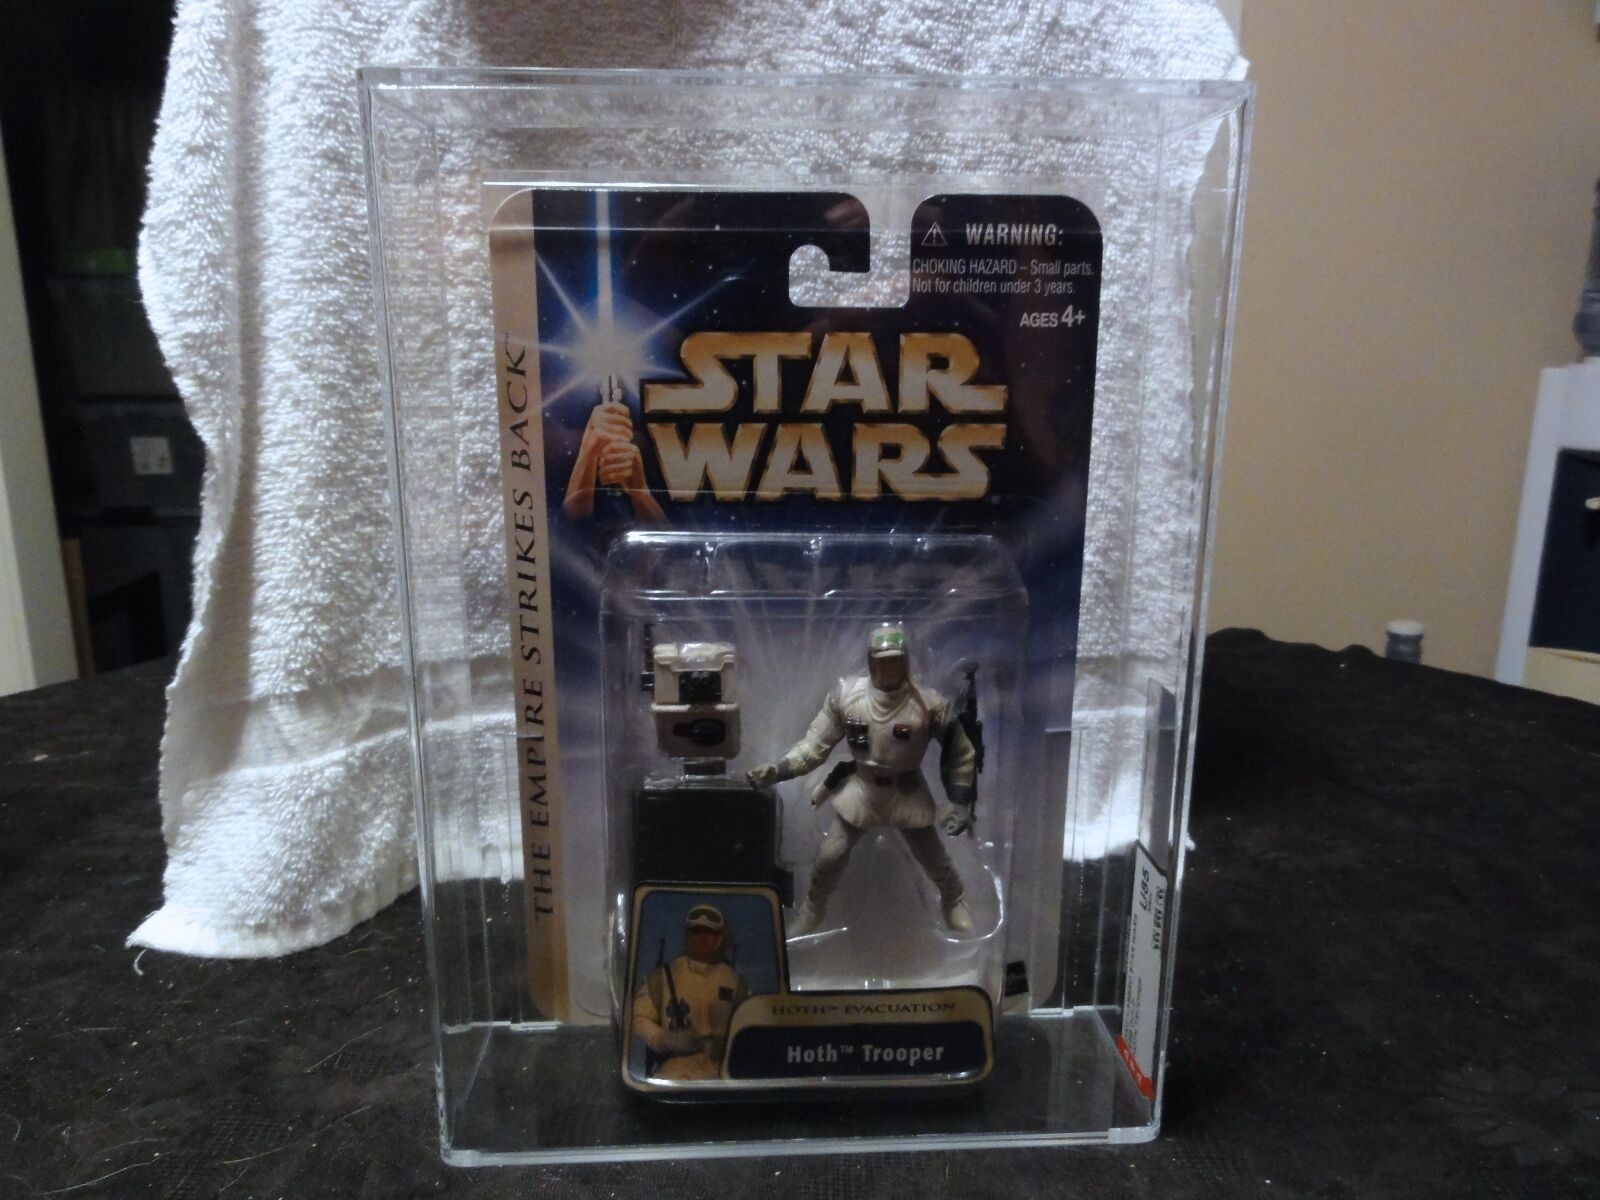 Star Wars 2003 Star Wars ESB Gold Hoth Trooper AFA Sealed MIB BOX